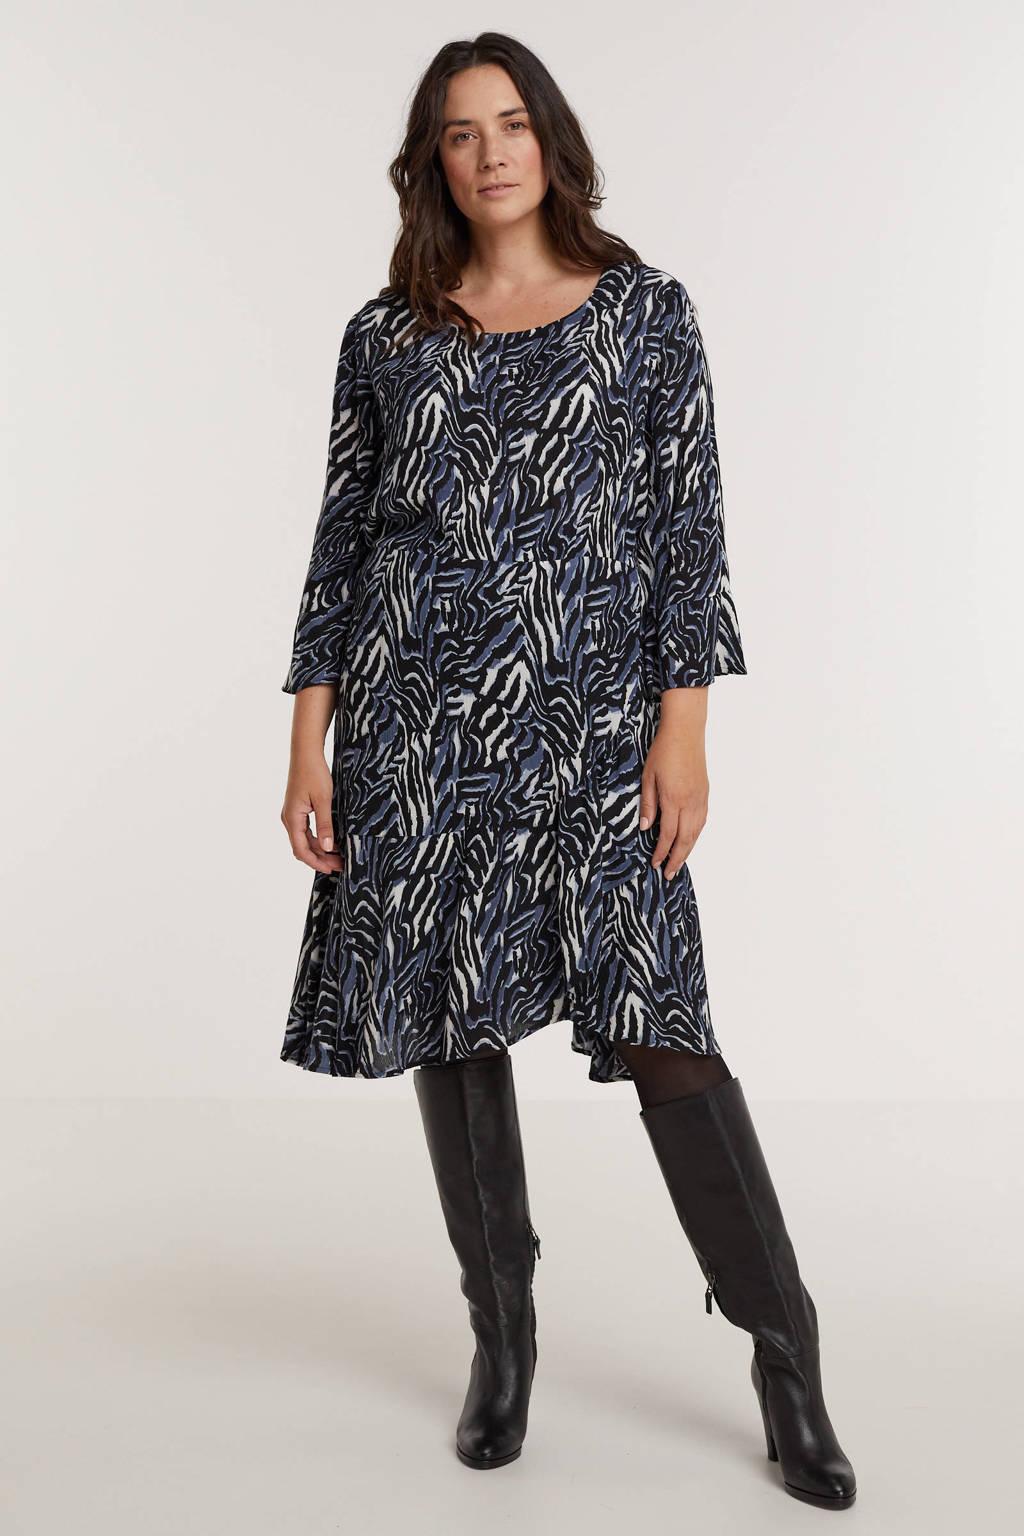 Zhenzi A-lijn jurk NOVAH 468 met zebraprint en volant blauw/wit/zwart, Blauw/wit/zwart